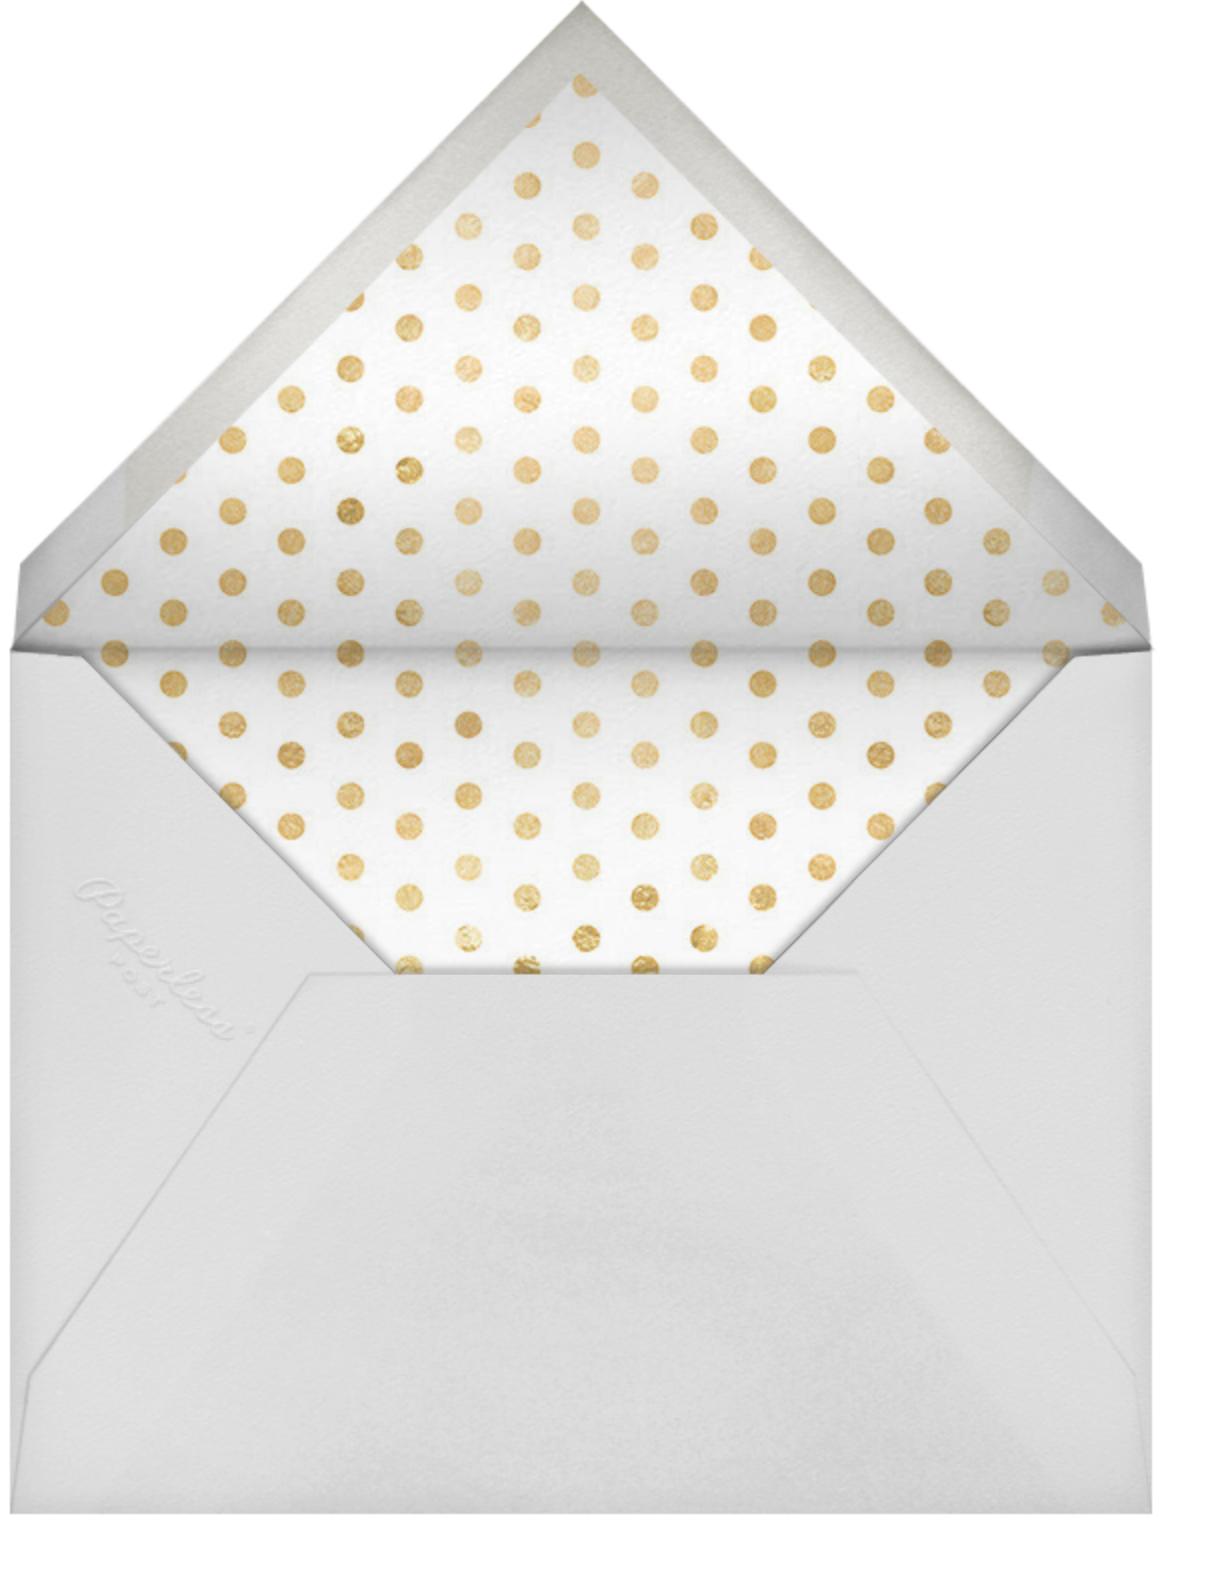 Princess Party - Sugar Paper - Kids' birthday - envelope back